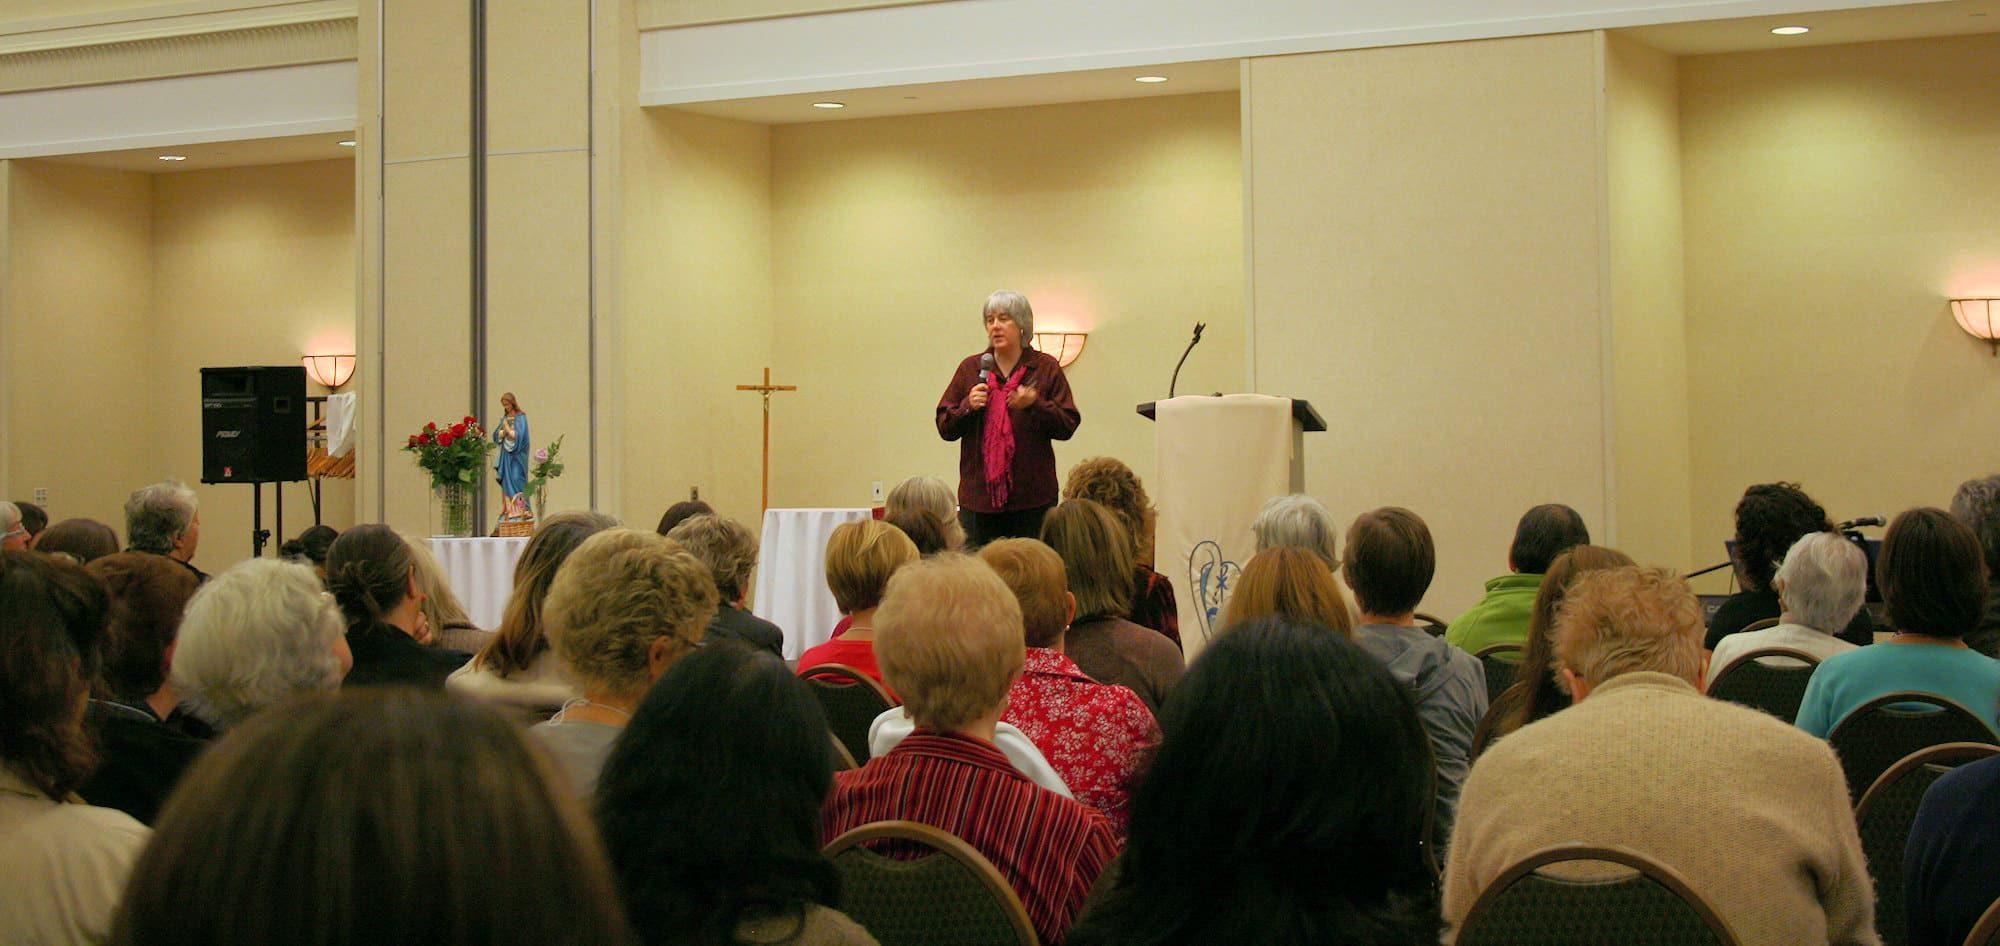 Terry Modica gives women's retreats